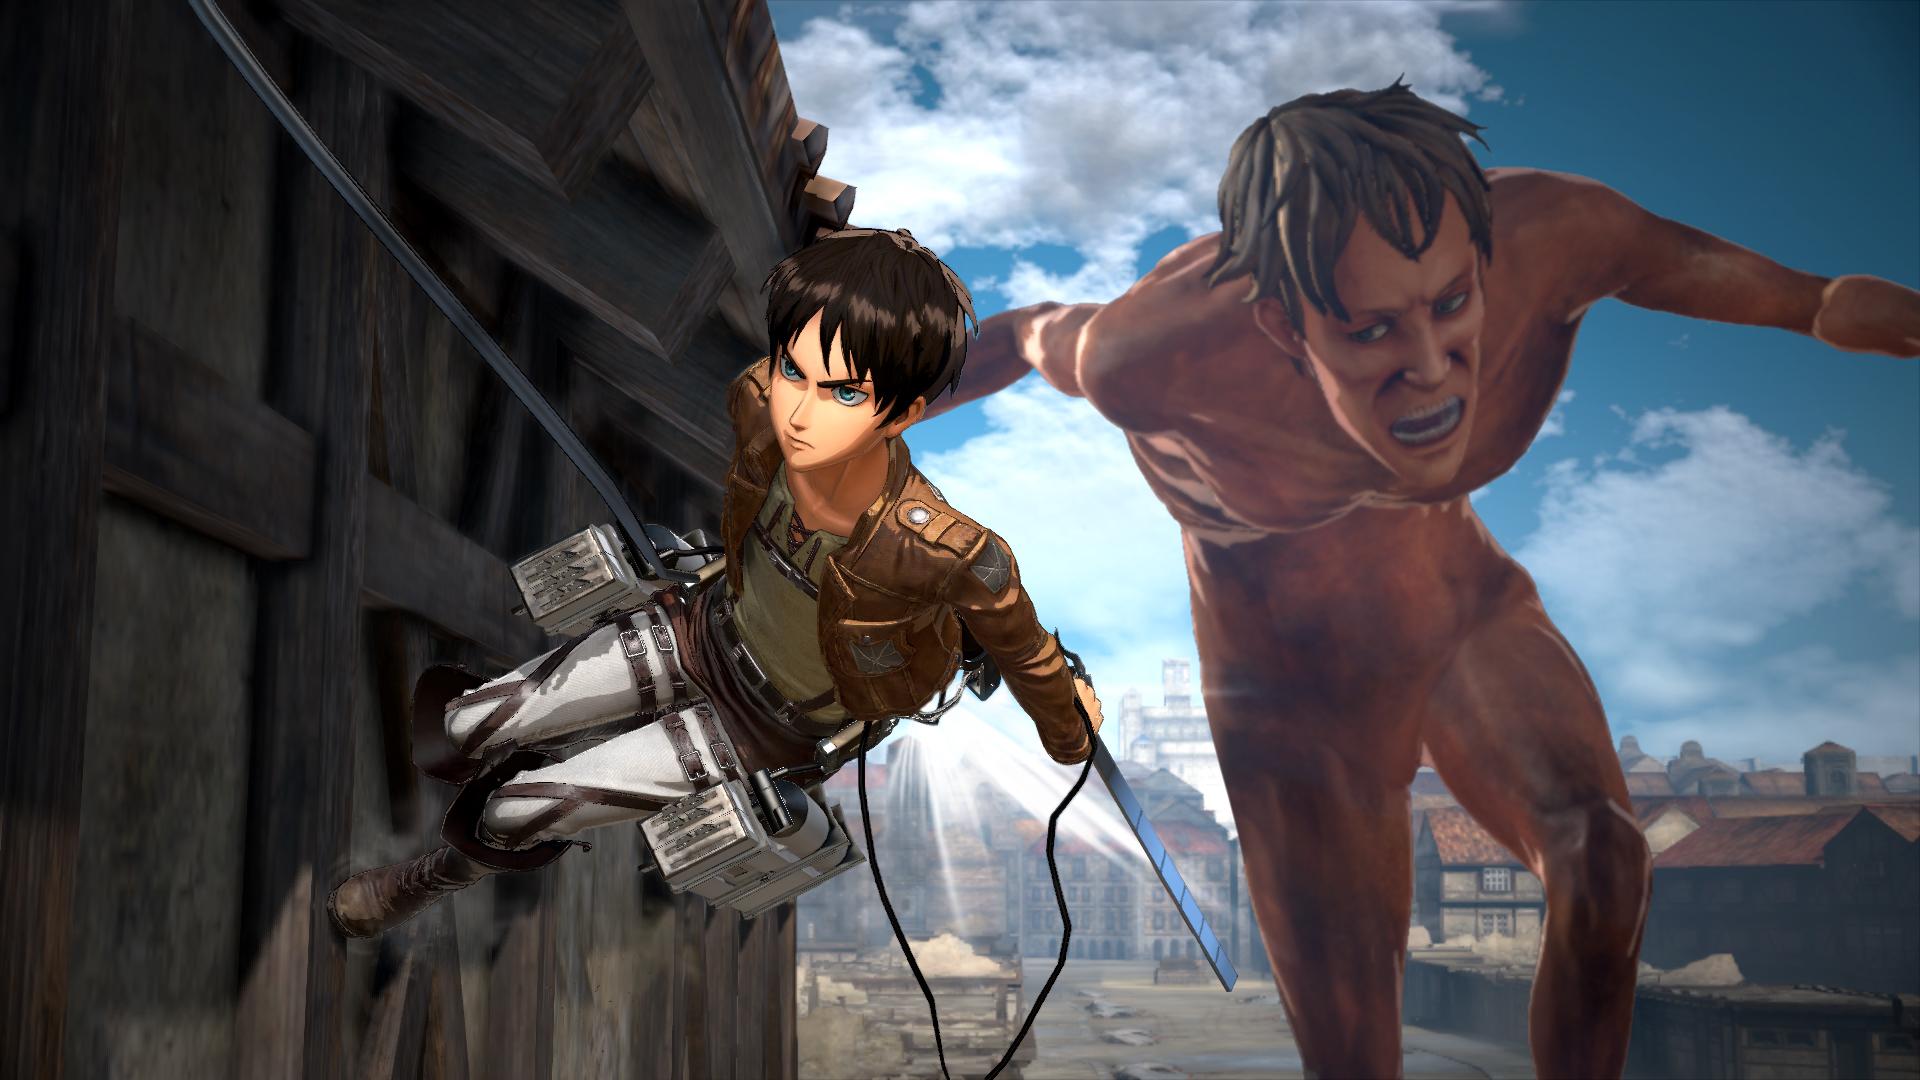 Attack On Titan 2 Releases March 15 In Japan Treasure Box